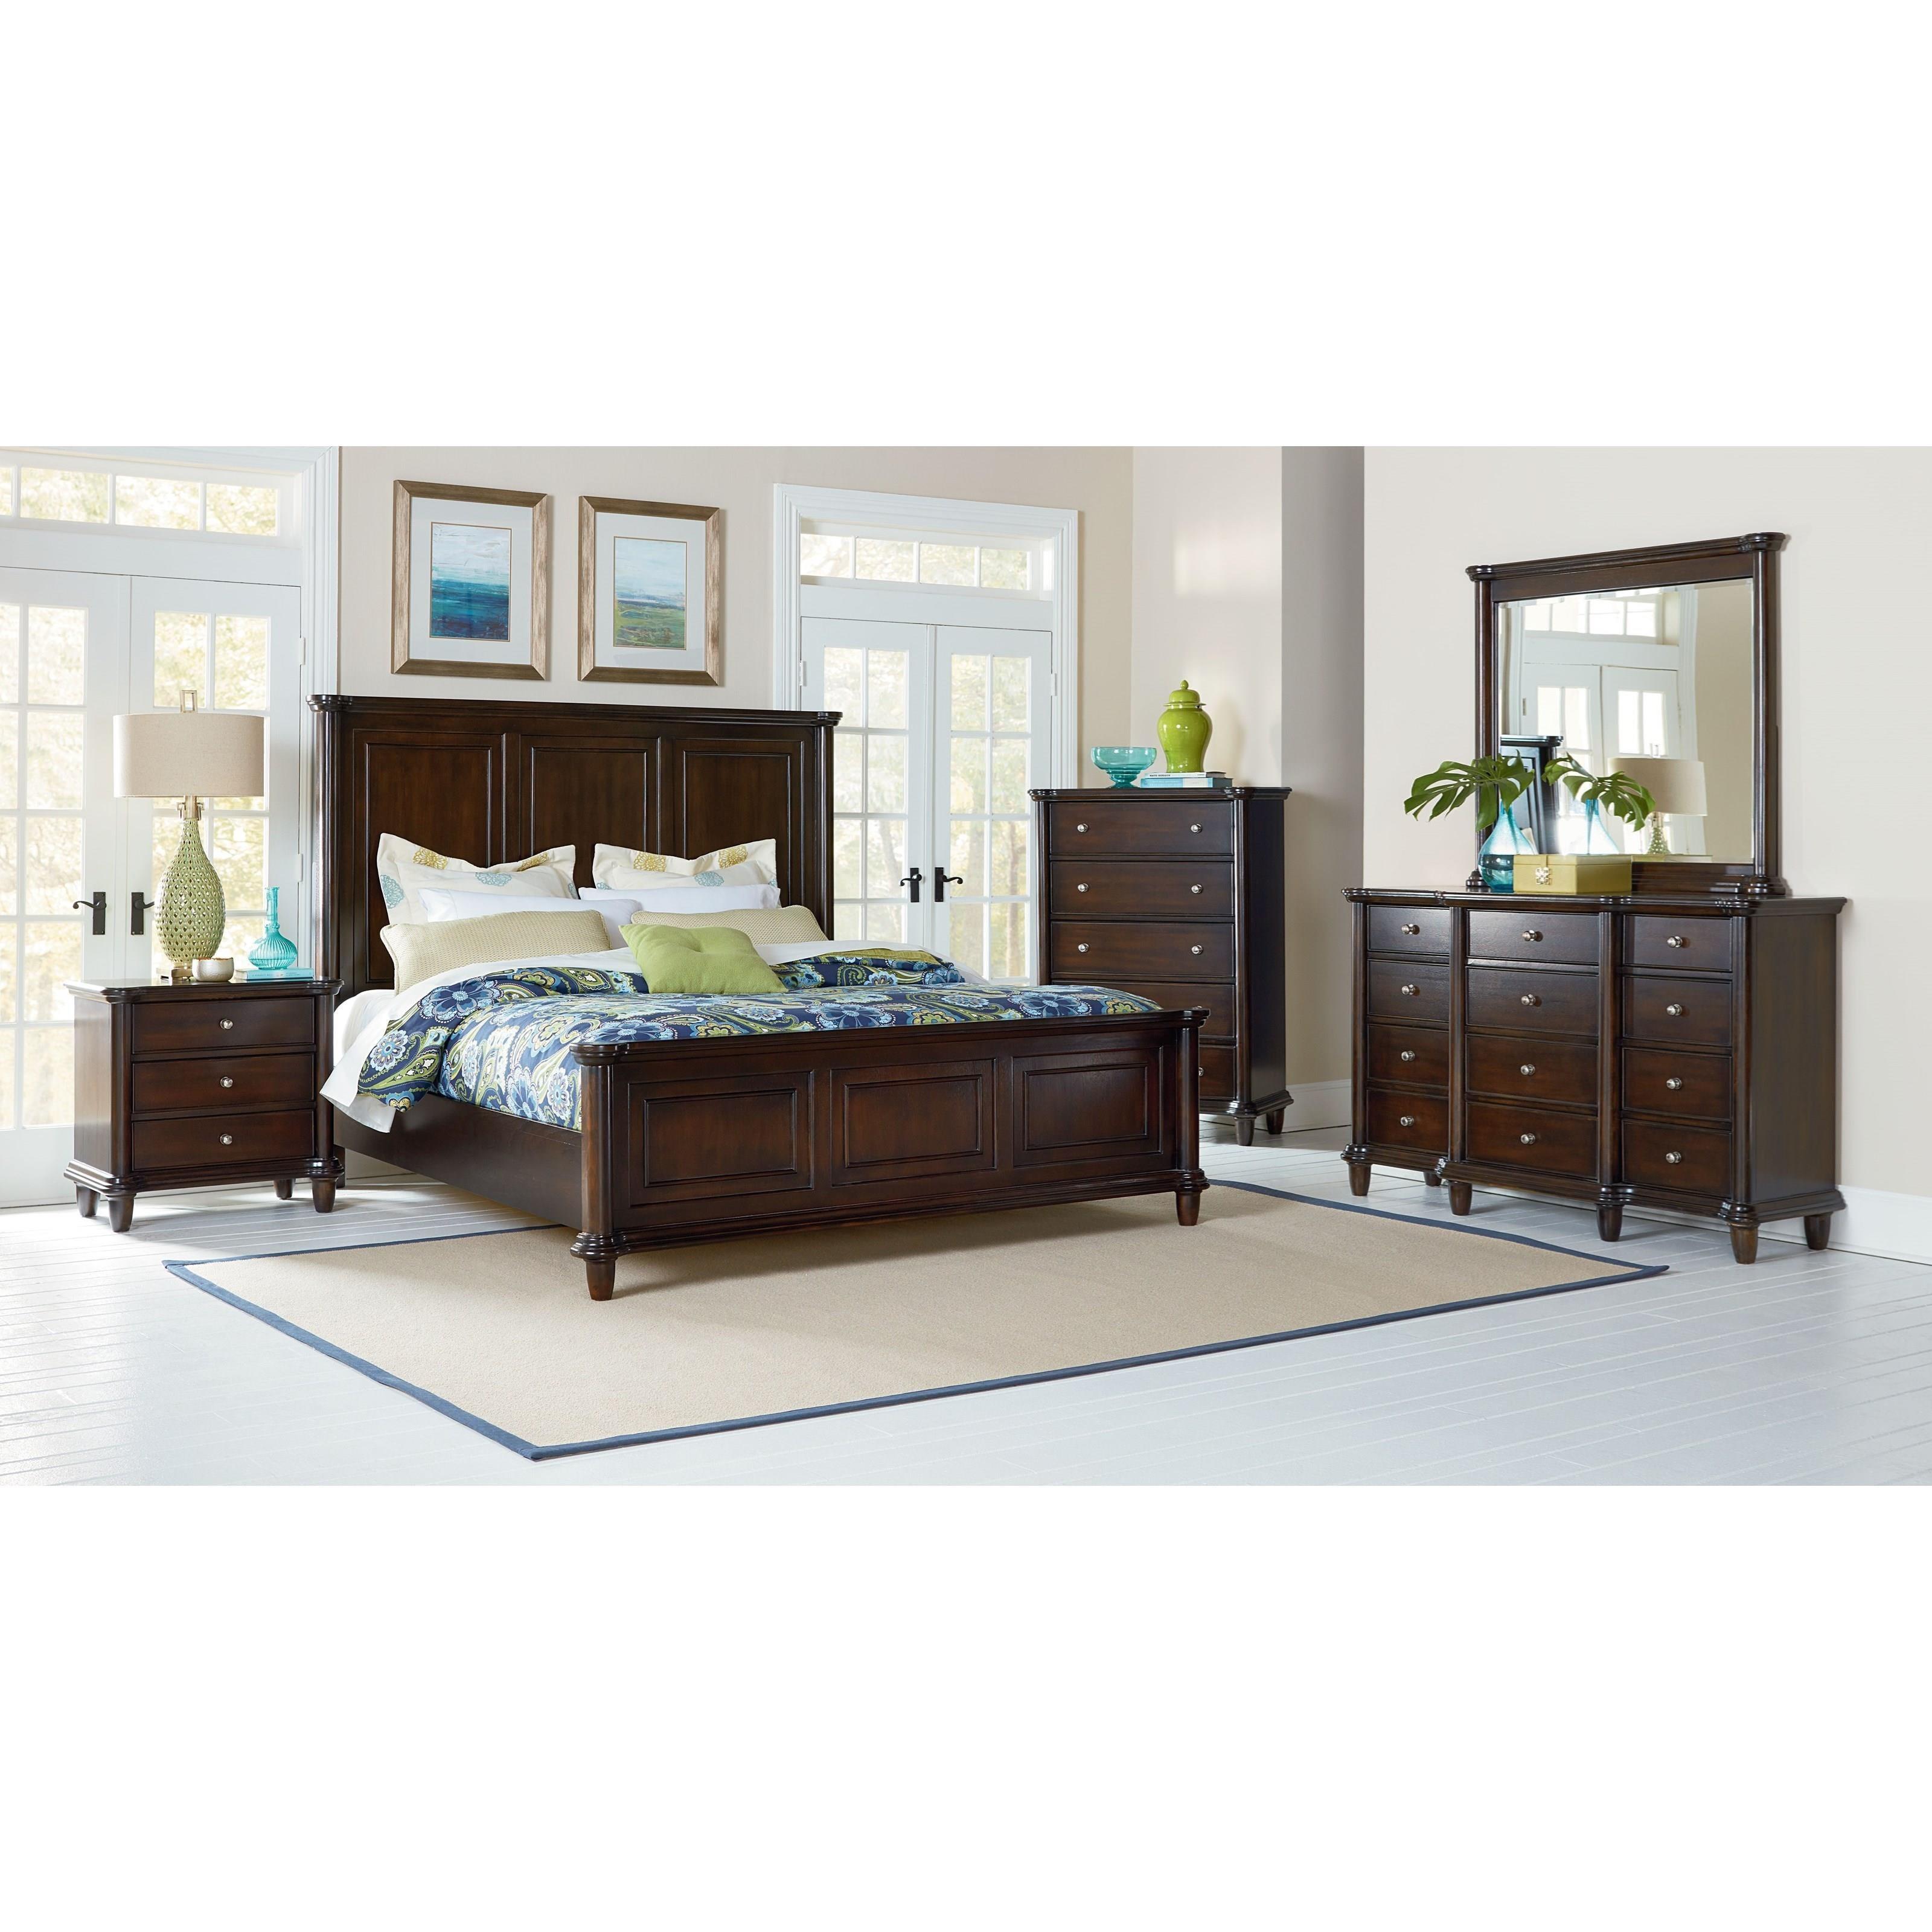 standard furniture kingsley queen 6piece bedroom group item number q 4